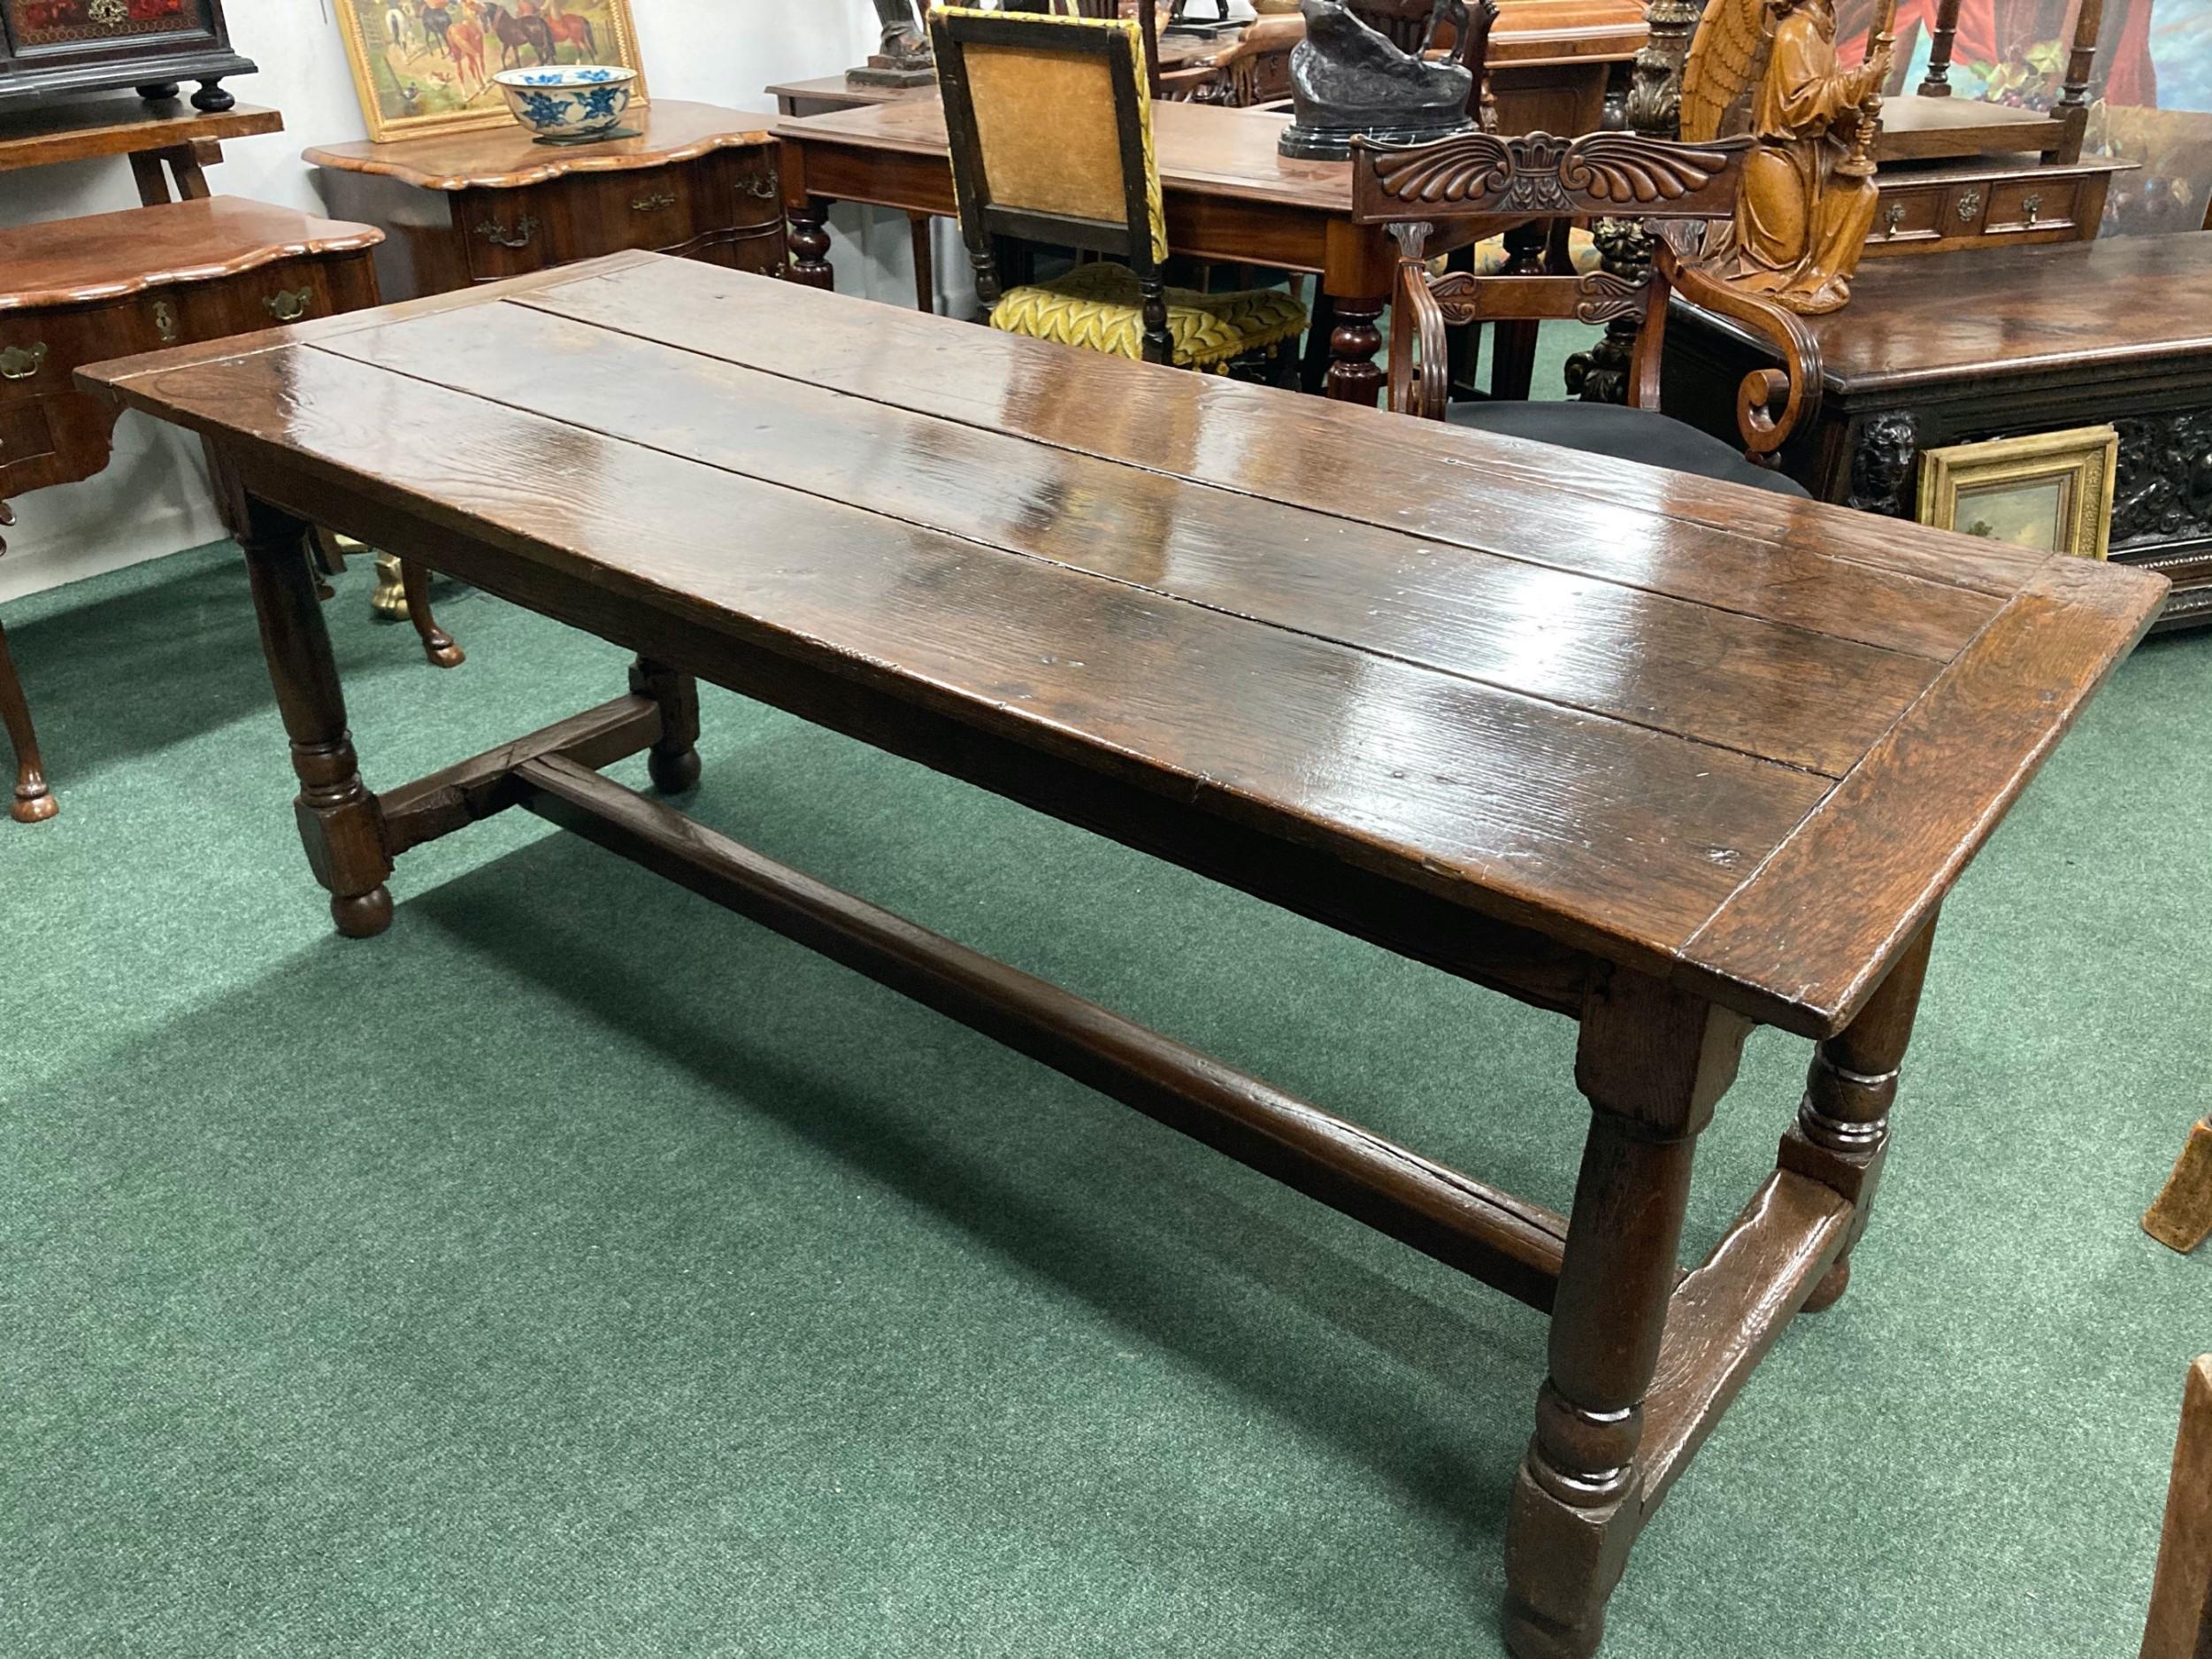 18th century oak farmhouse dining or kitchen table